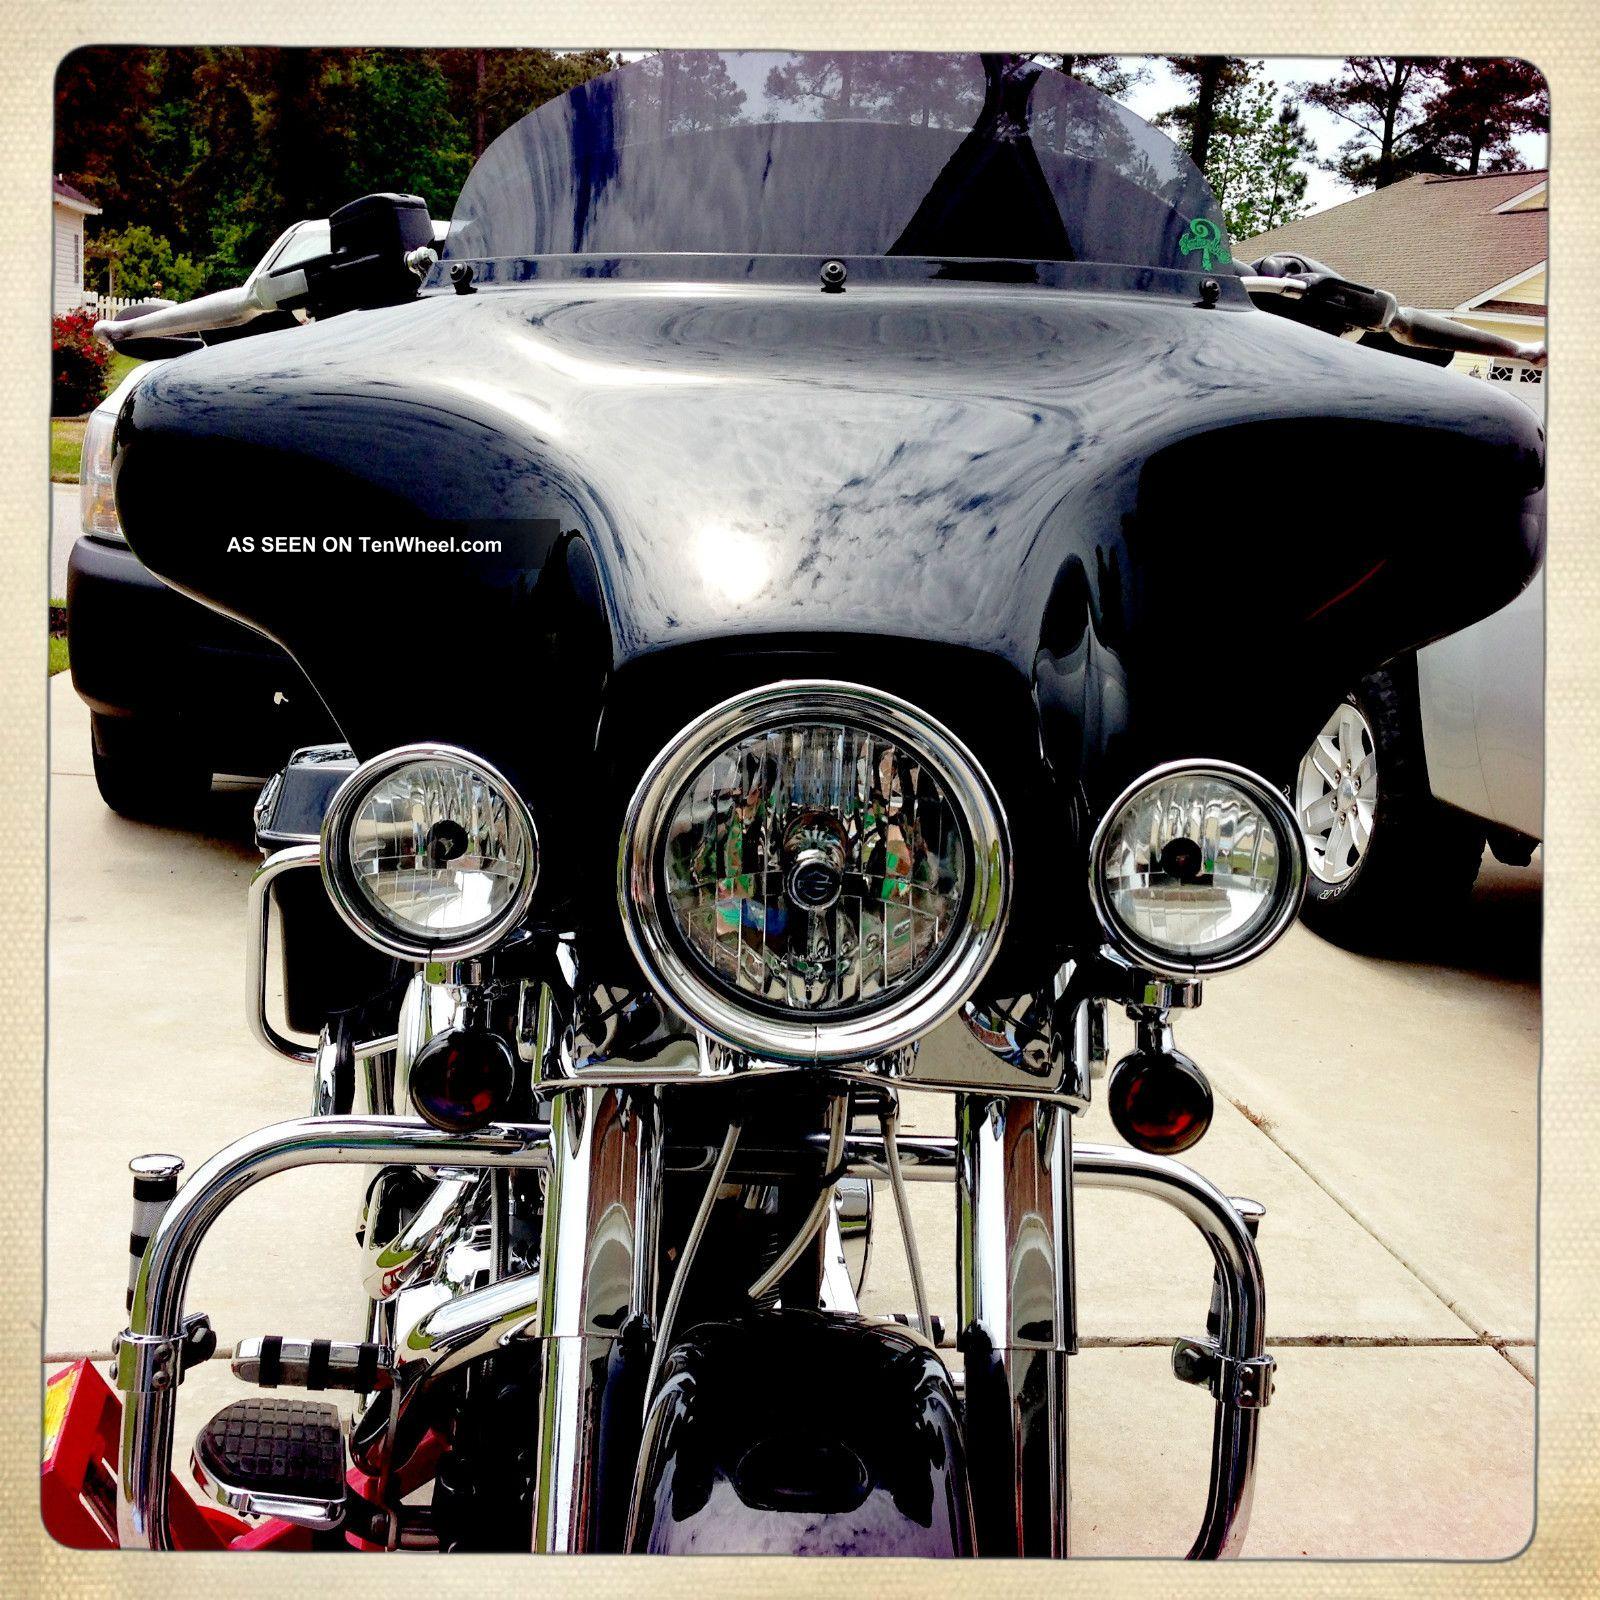 2001 Harley Davidson Flht Screamin Eagle Electra Glide Touring photo